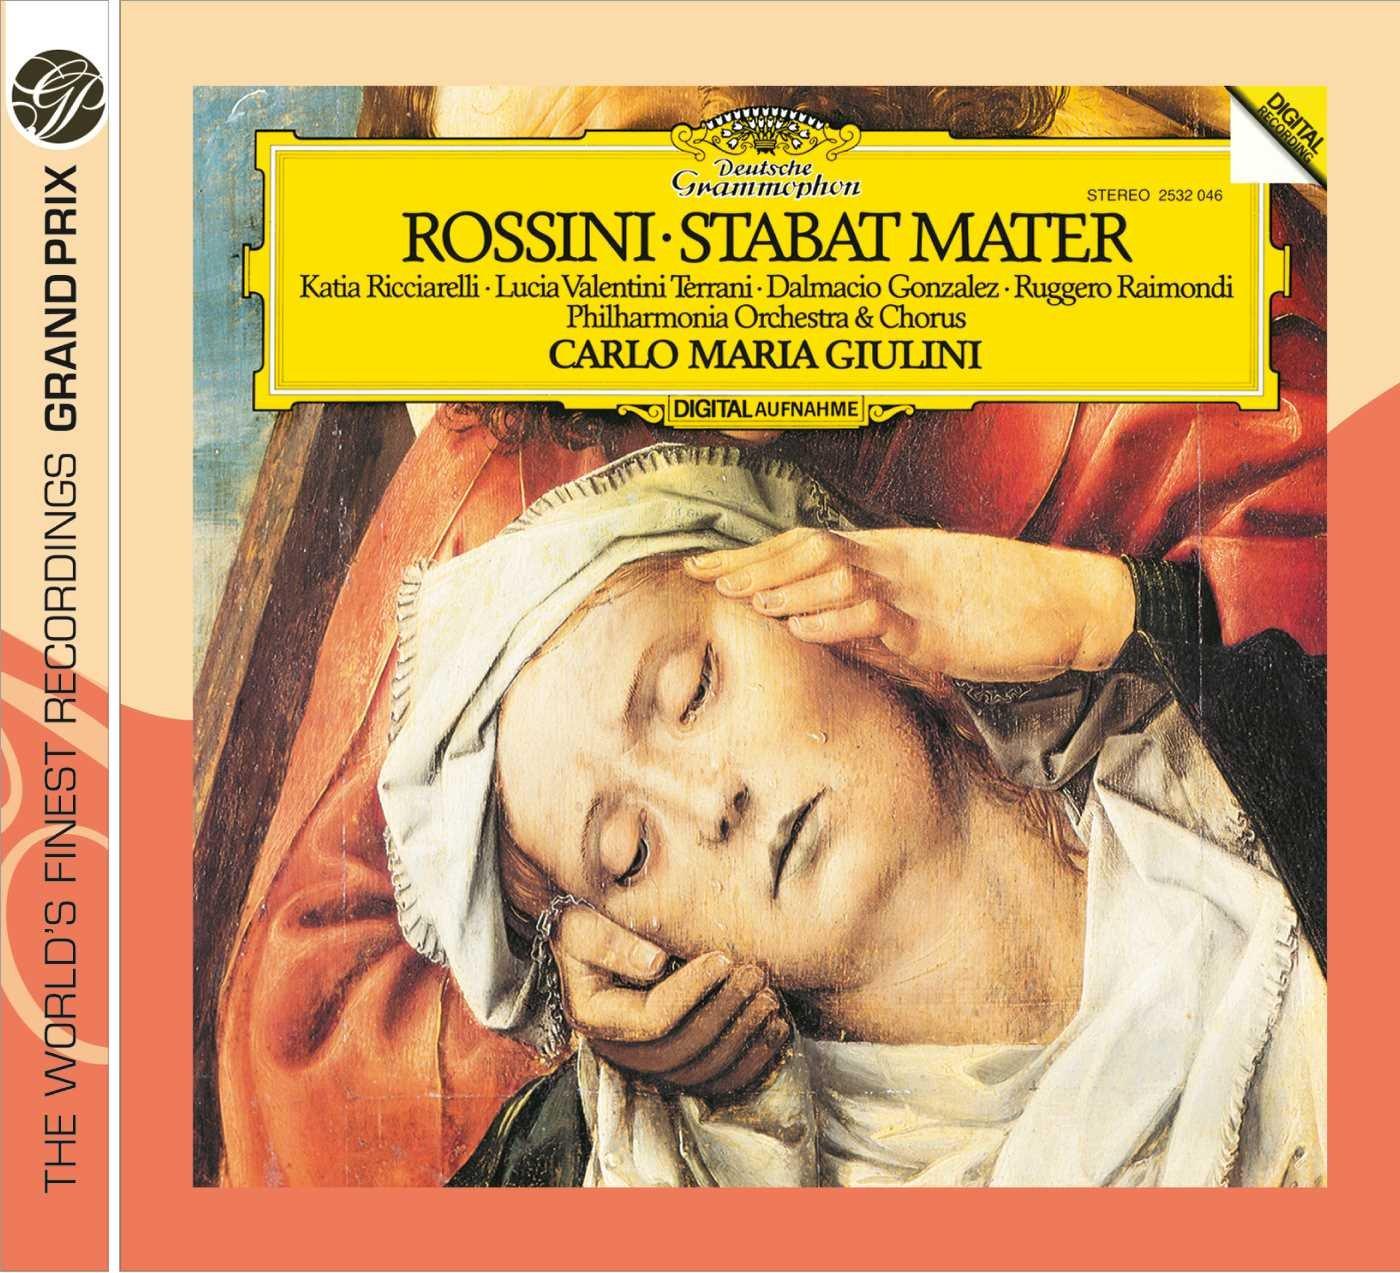 лучшая цена Carlo Maria Giulini. Rossini: Stabat Mater